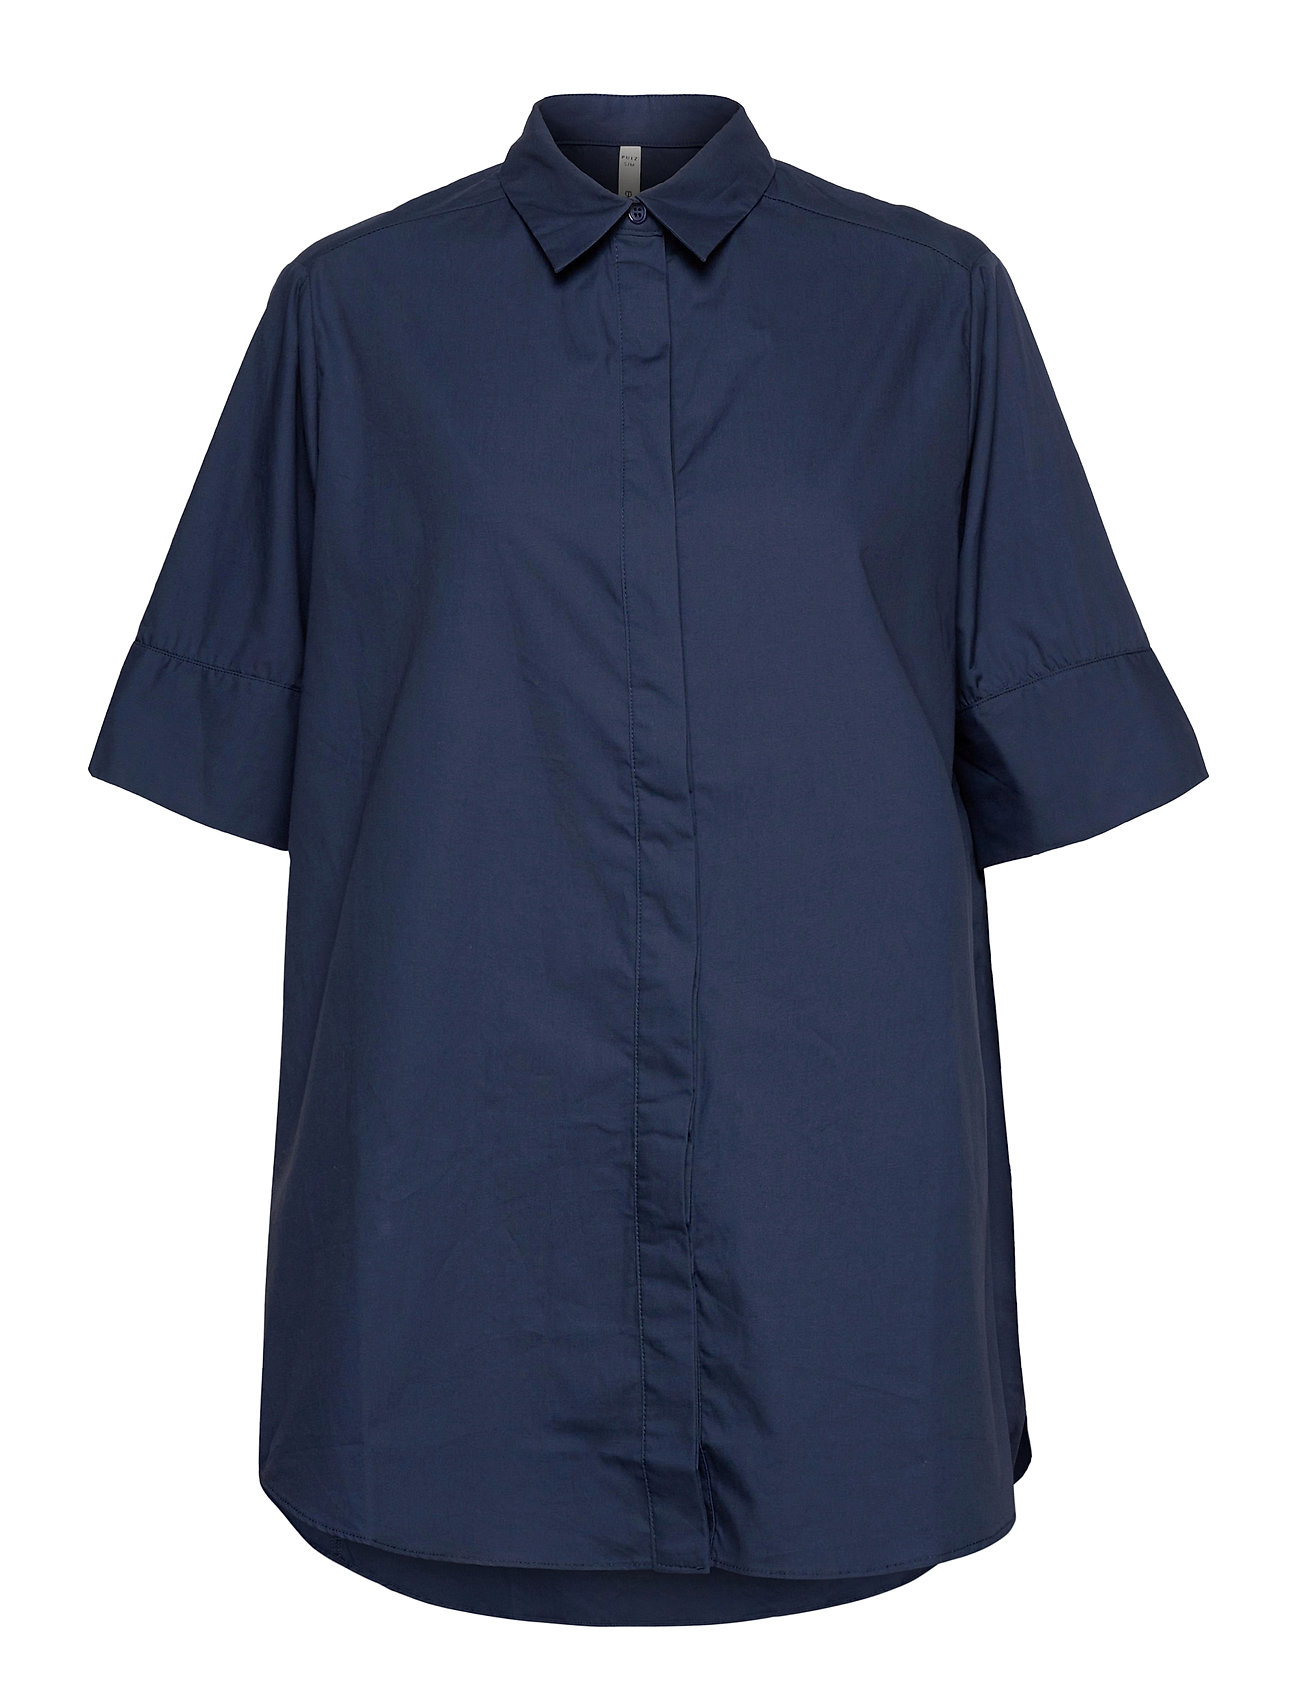 Image of Pzwillo Shirt Kortærmet Skjorte Blå Pulz Jeans (3436652773)